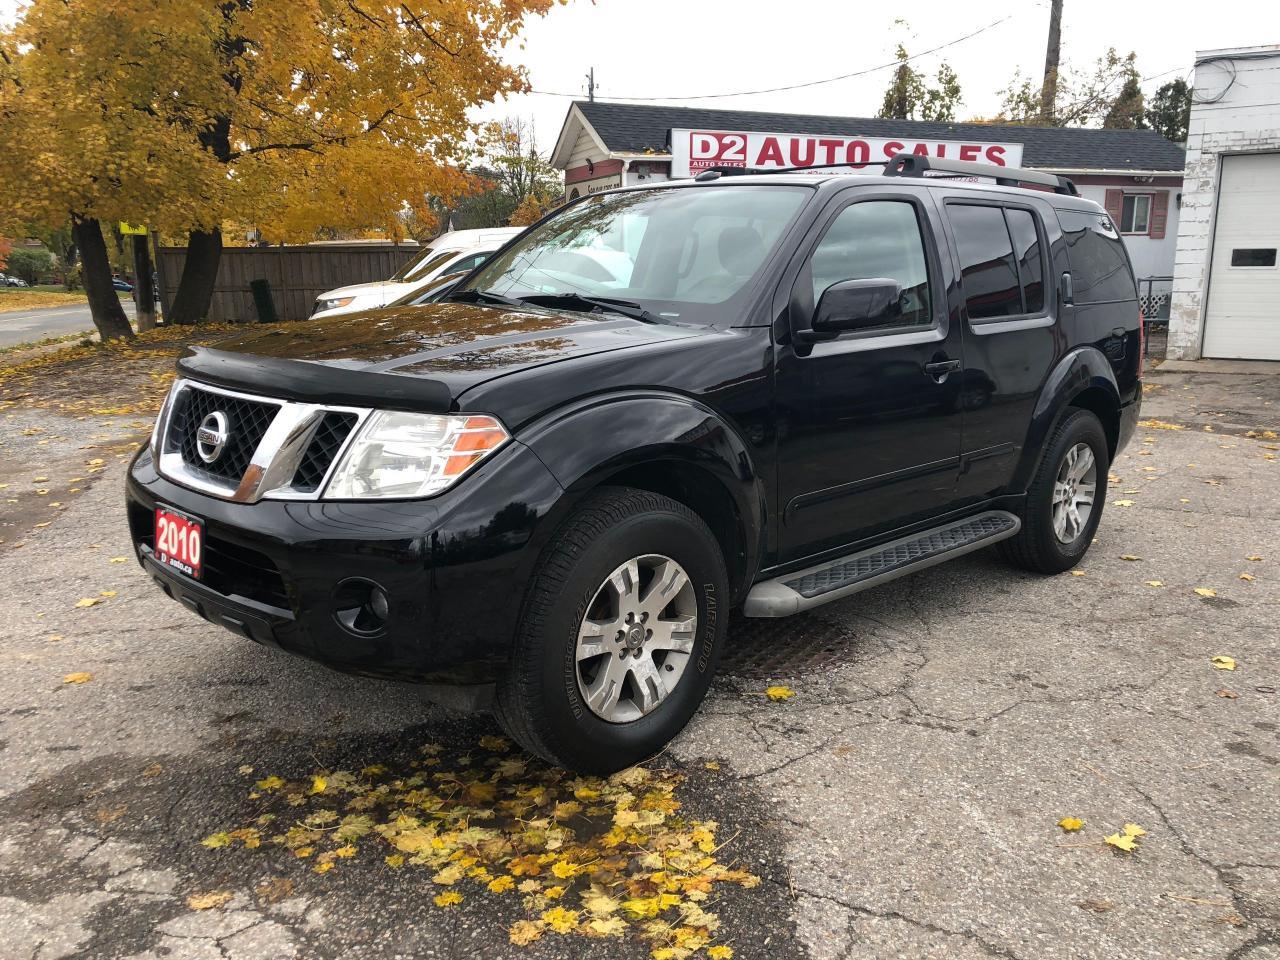 2010 Nissan Pathfinder Certified/Backup Cam/Heated Seats/7 Passenger